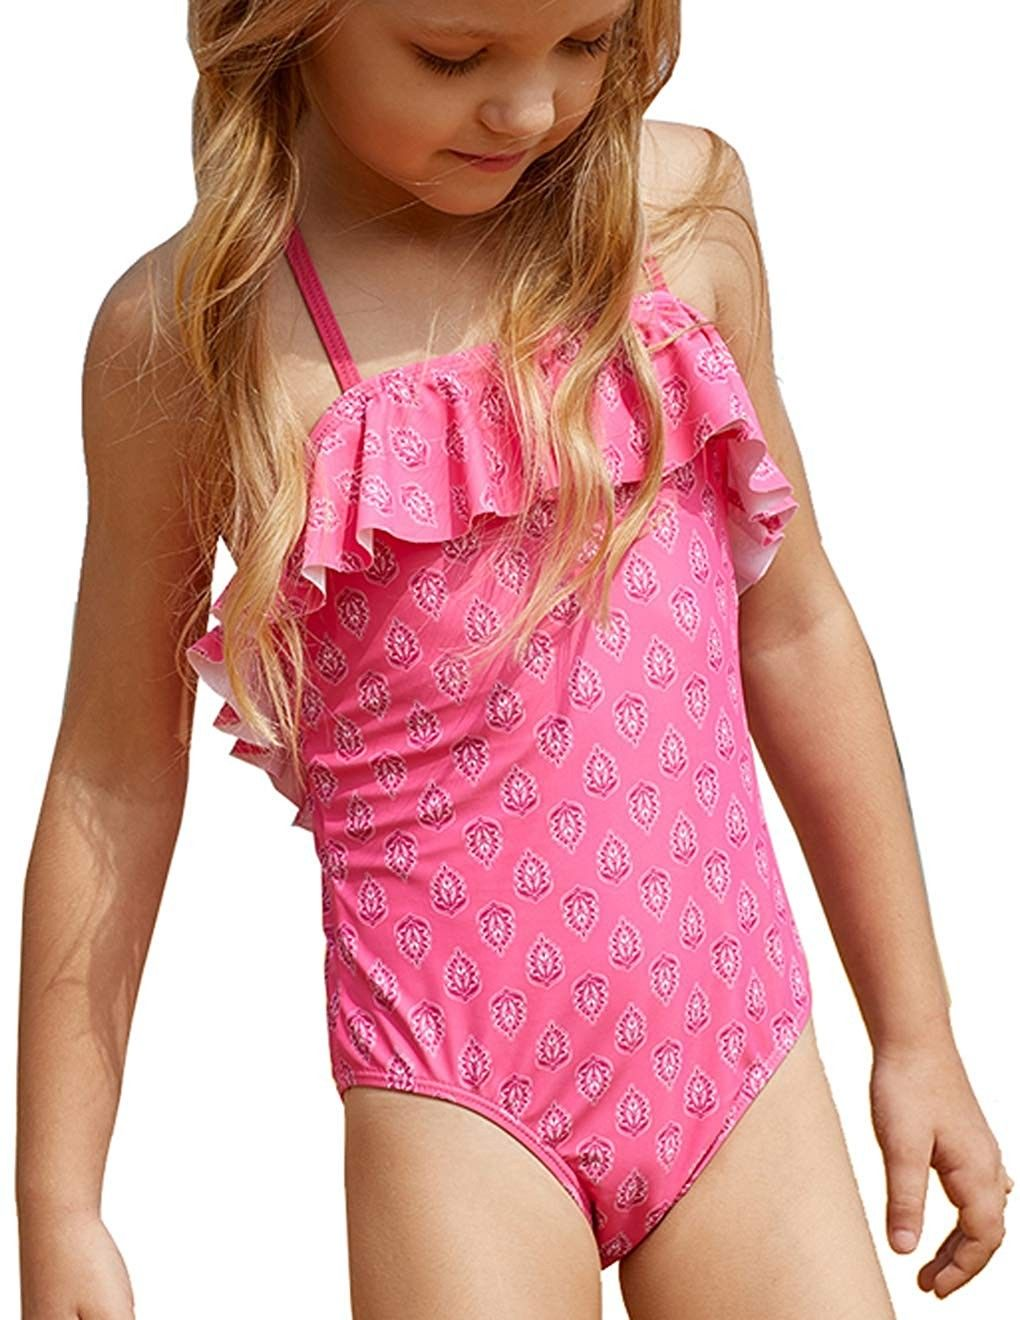 c43db38a331 Little Girls' Ruffle One Piece Swimsuit Crisscross Back Swimwear Size 4-8 -  CX18NARQ3XH - Girls' Clothing, Swim, One-Pieces #OnePieces #Girls' #Clothing  ...